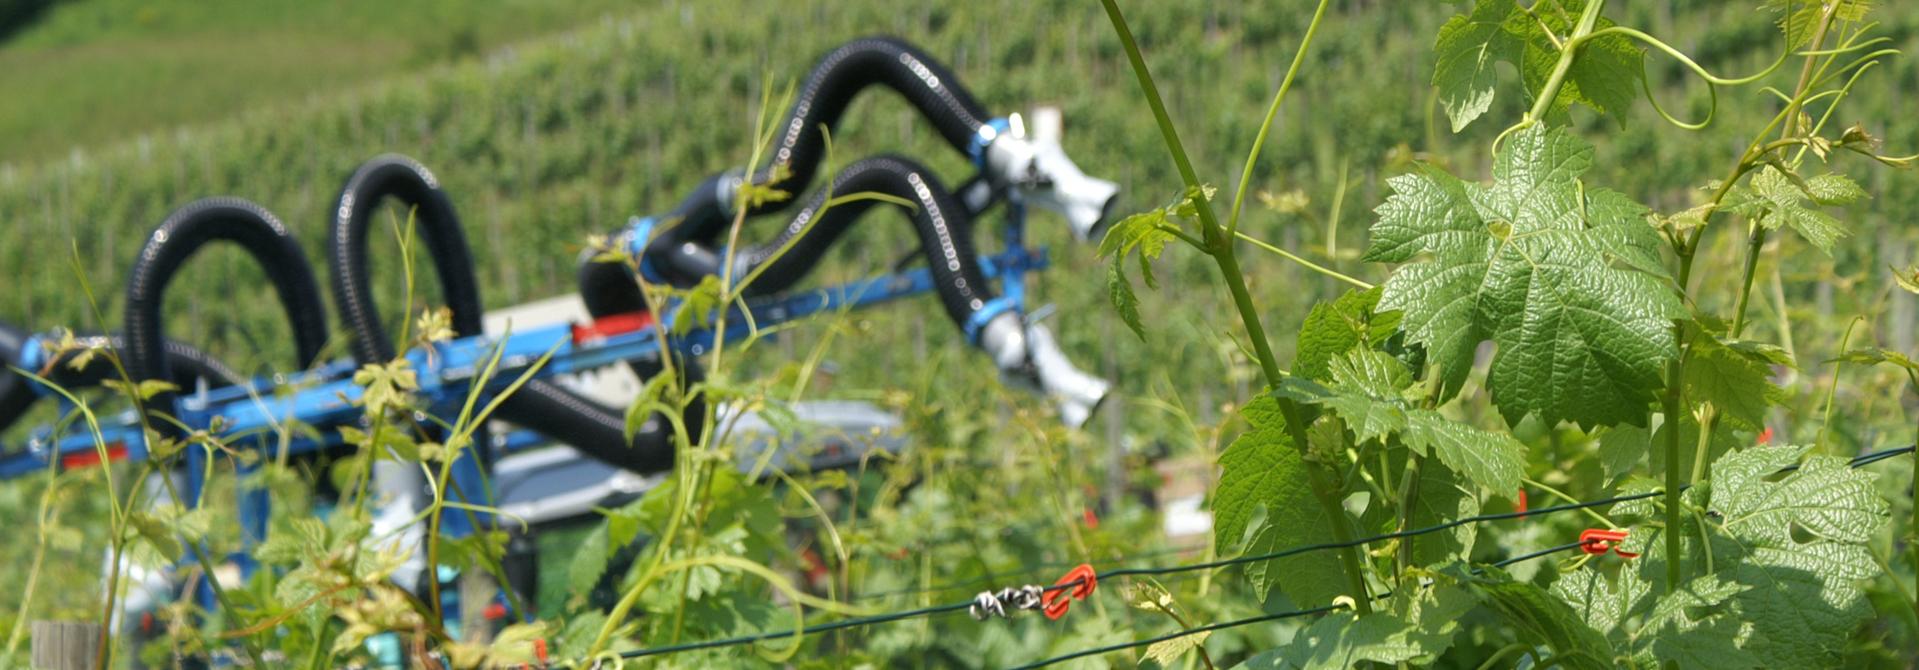 Pflanzenschutzgeru00e4te im Einsatz>